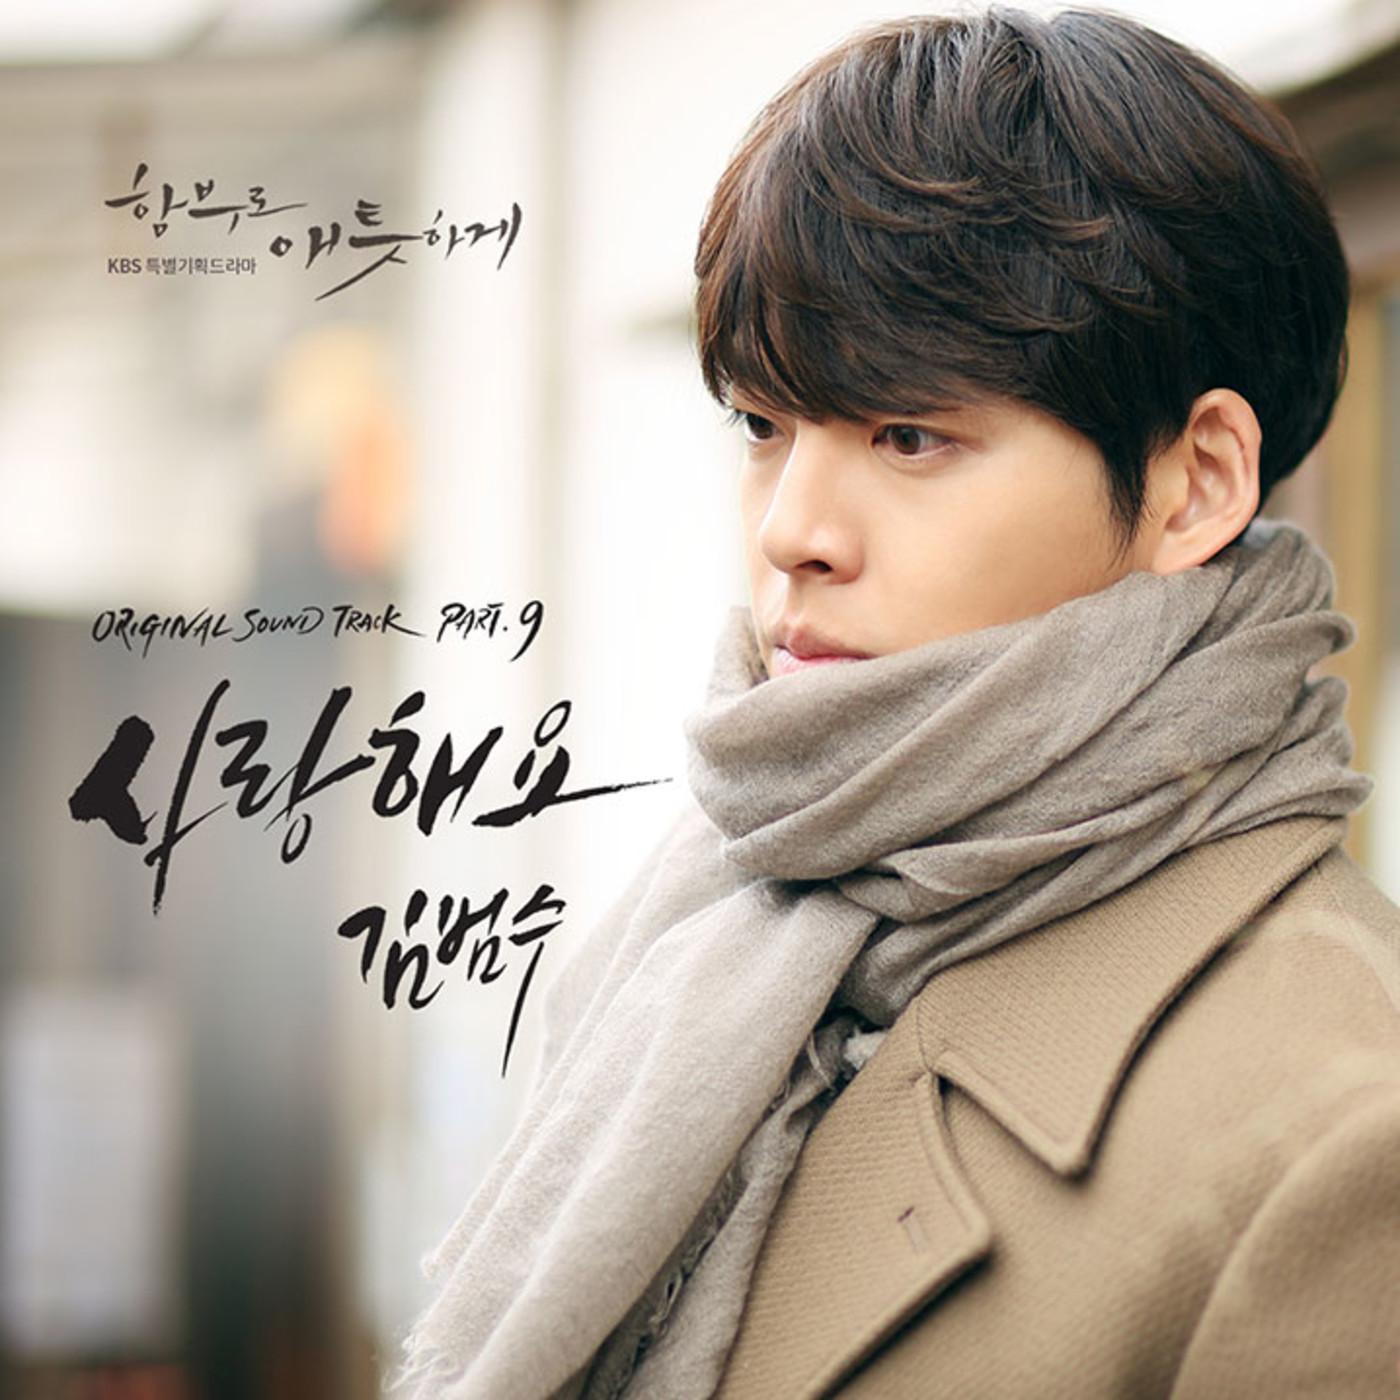 Kpop Playlist OST August 2016 Mix